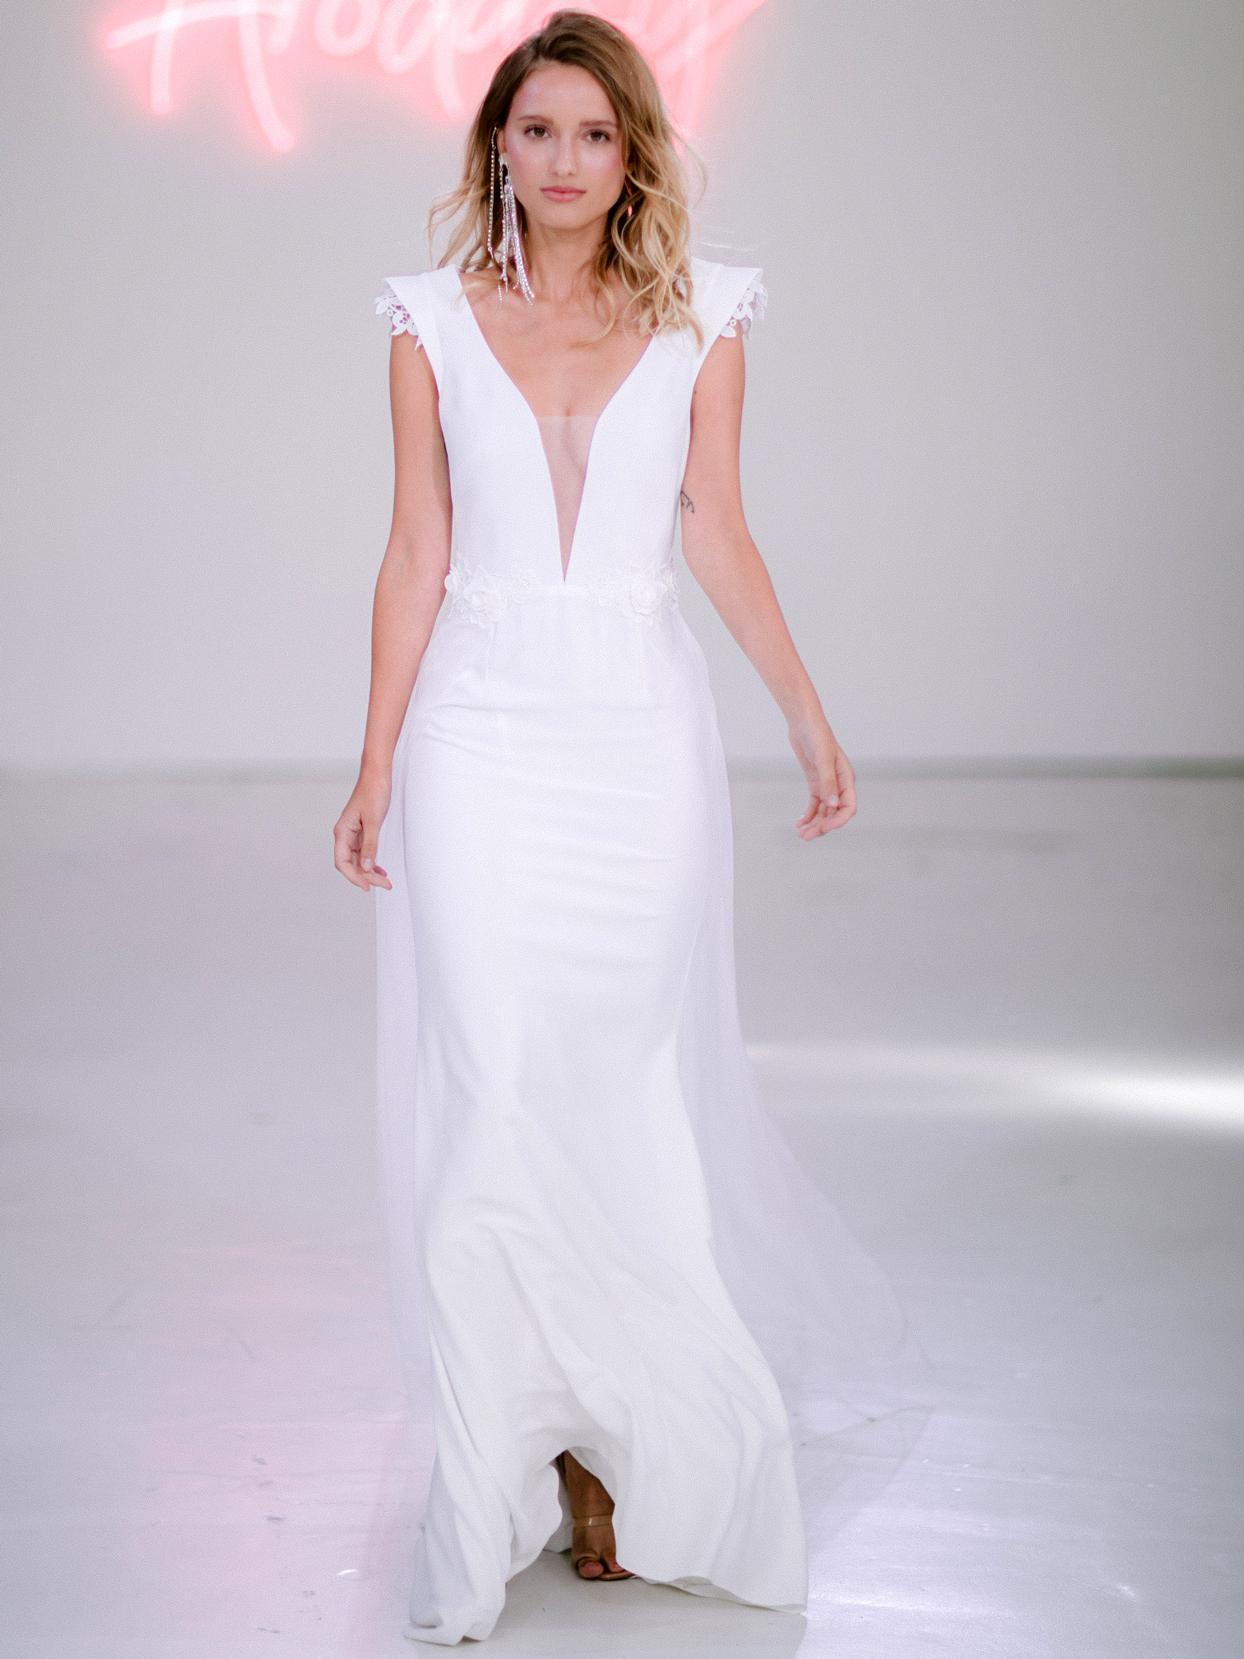 Rime Arodaky X The Mews Bridal cap sleeve plunging v-neck wedding dress fall 2020